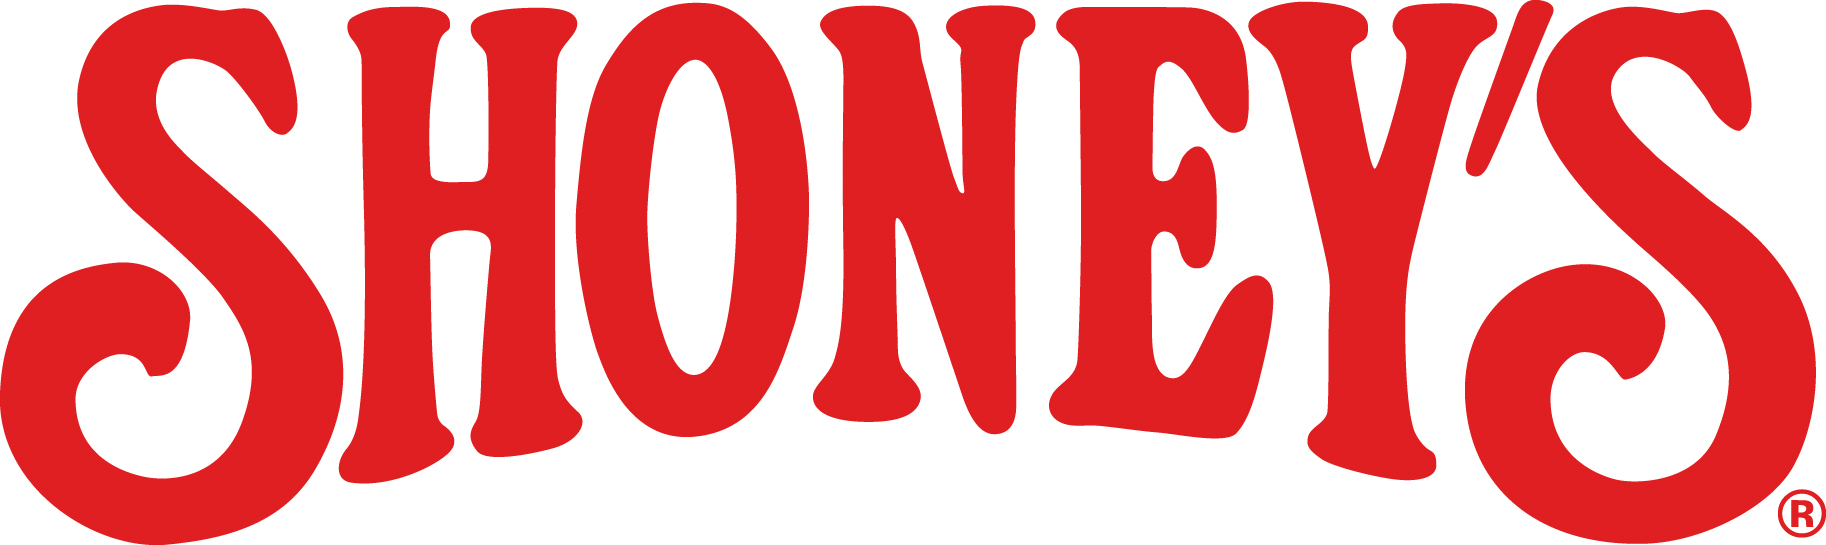 Shoneys_Logo.jpg